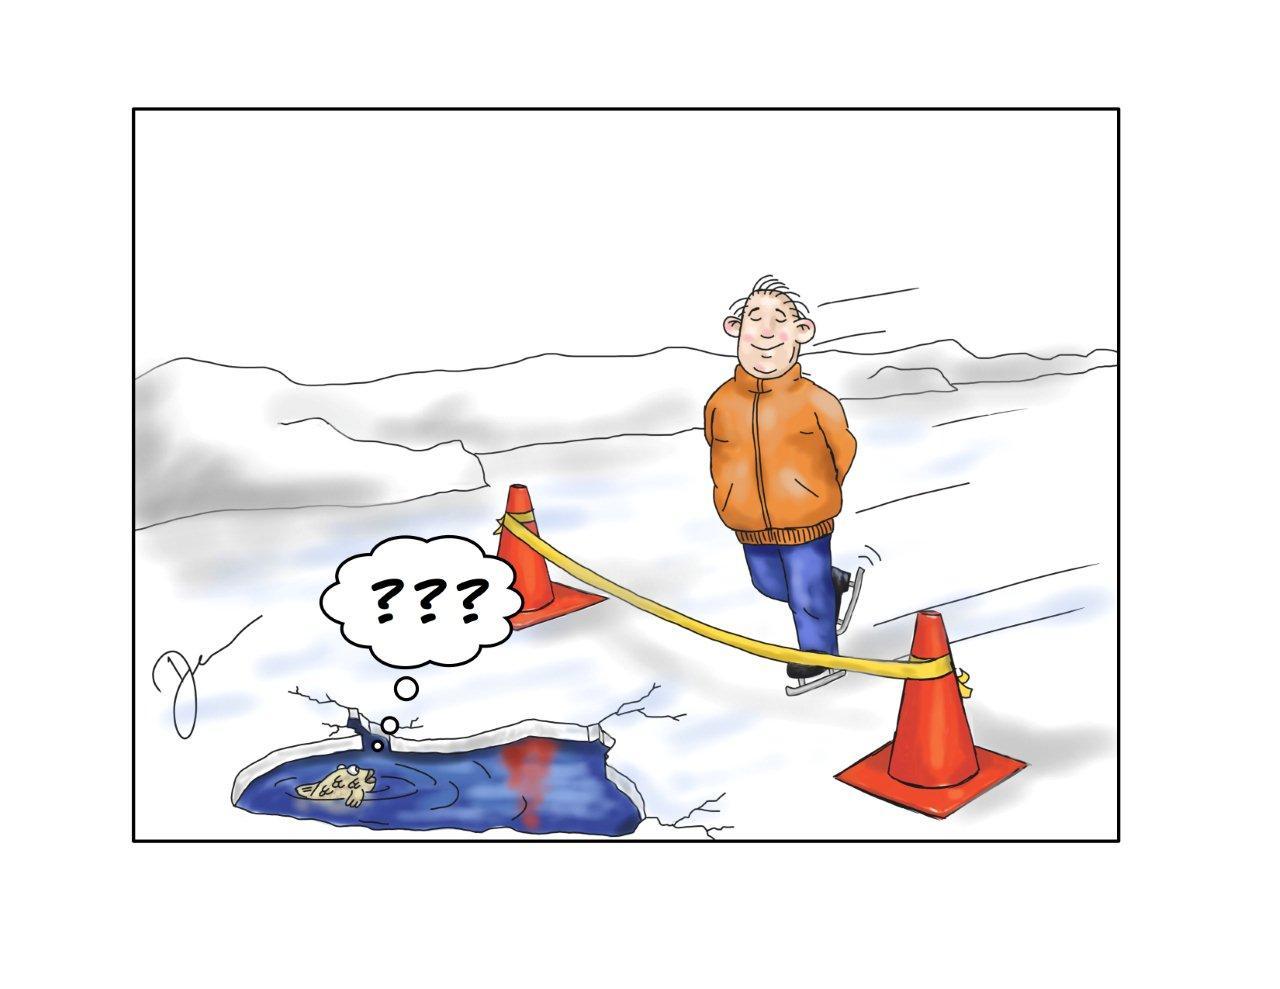 Henri skating